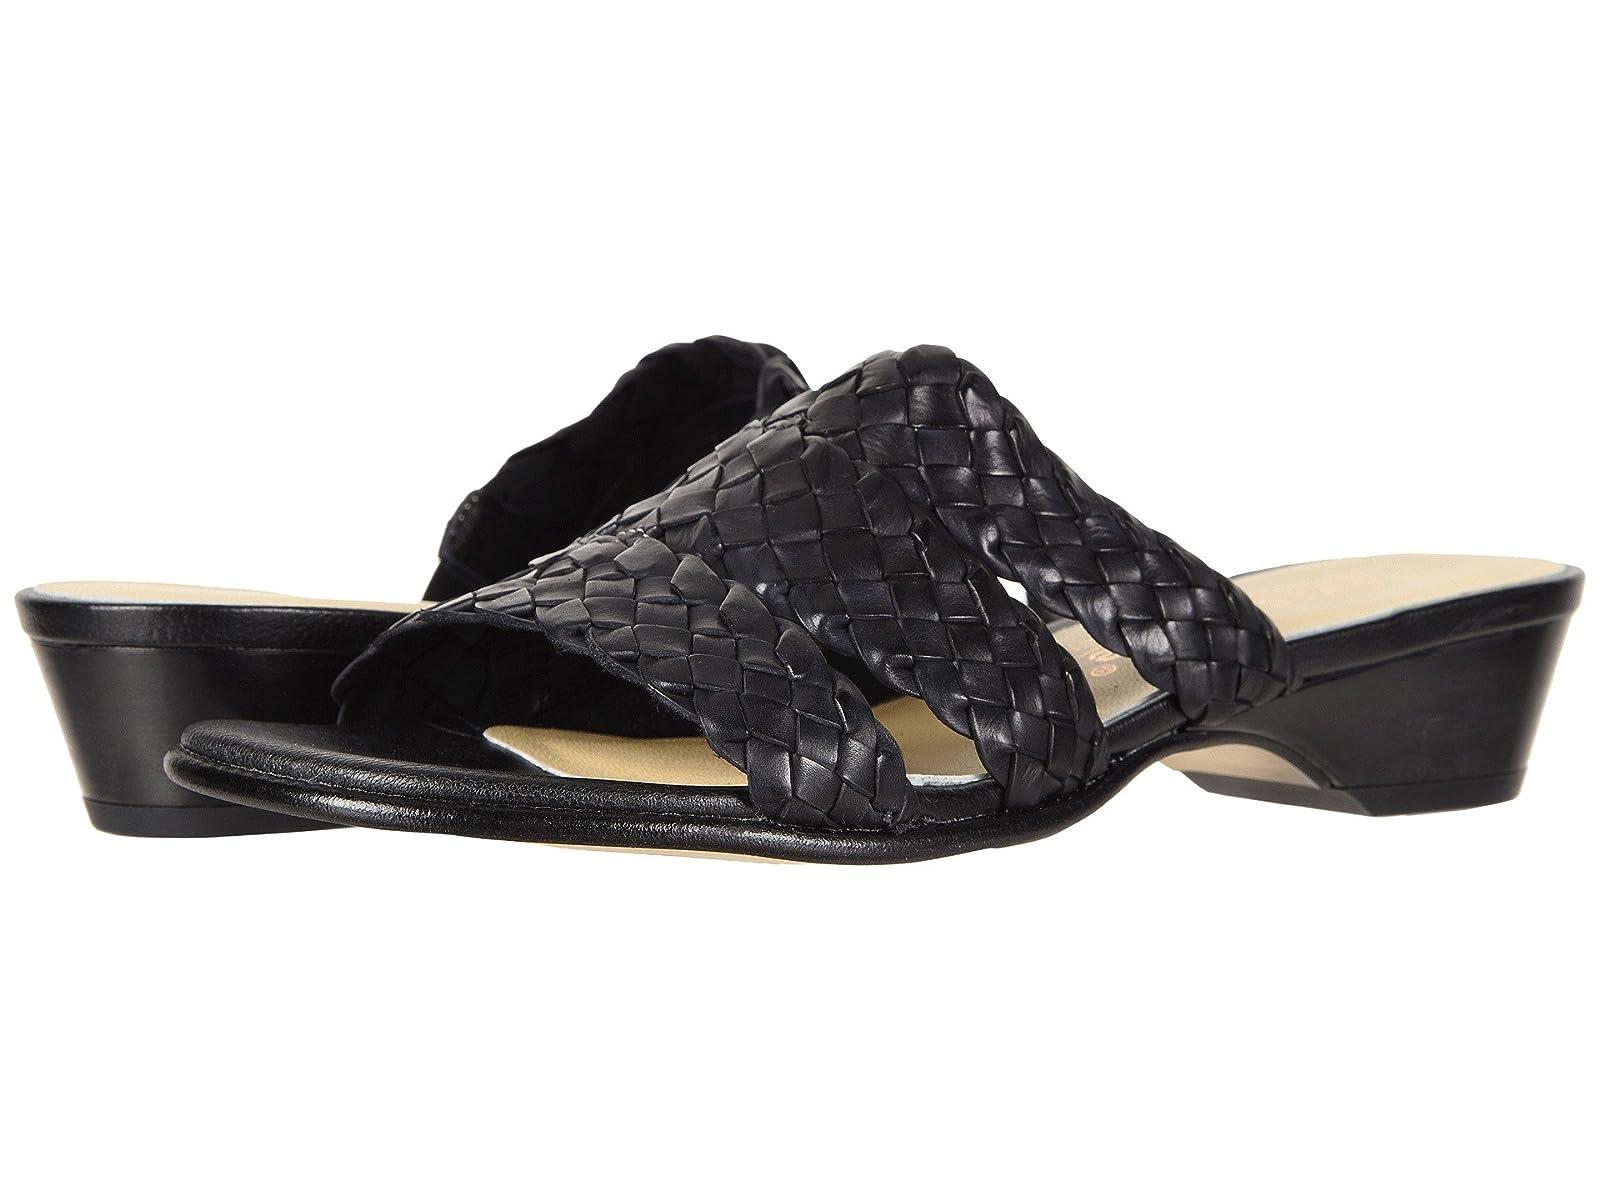 David Tate AdagioCheap and distinctive eye-catching shoes